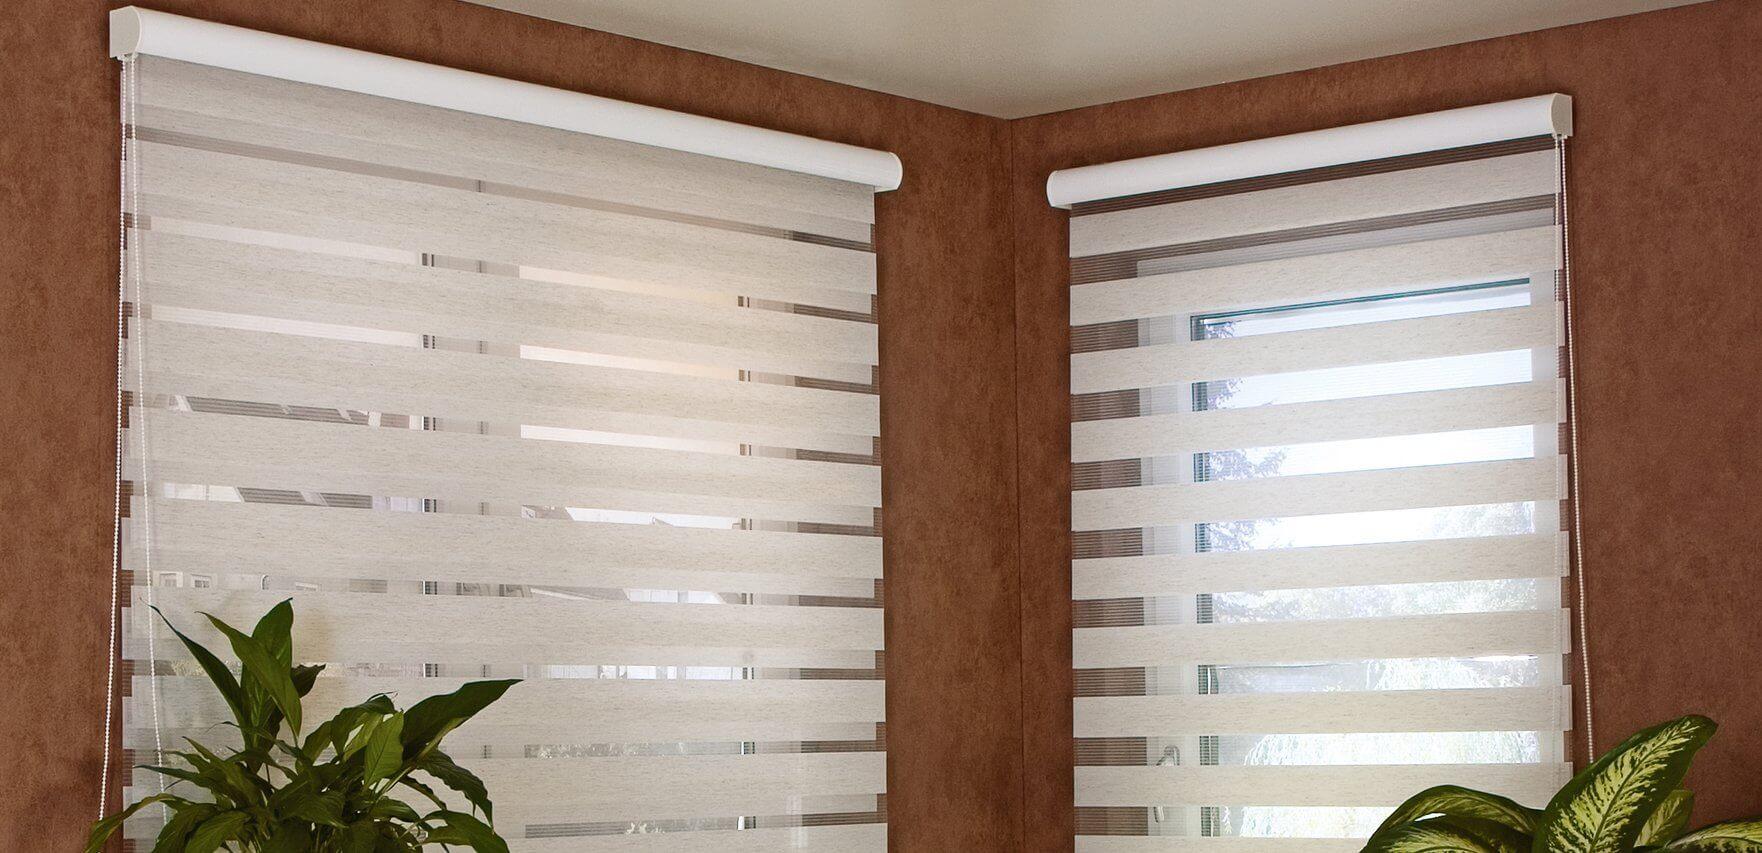 Full Size of Raffrollo Küchenfenster Plissees Küche Wohnzimmer Raffrollo Küchenfenster